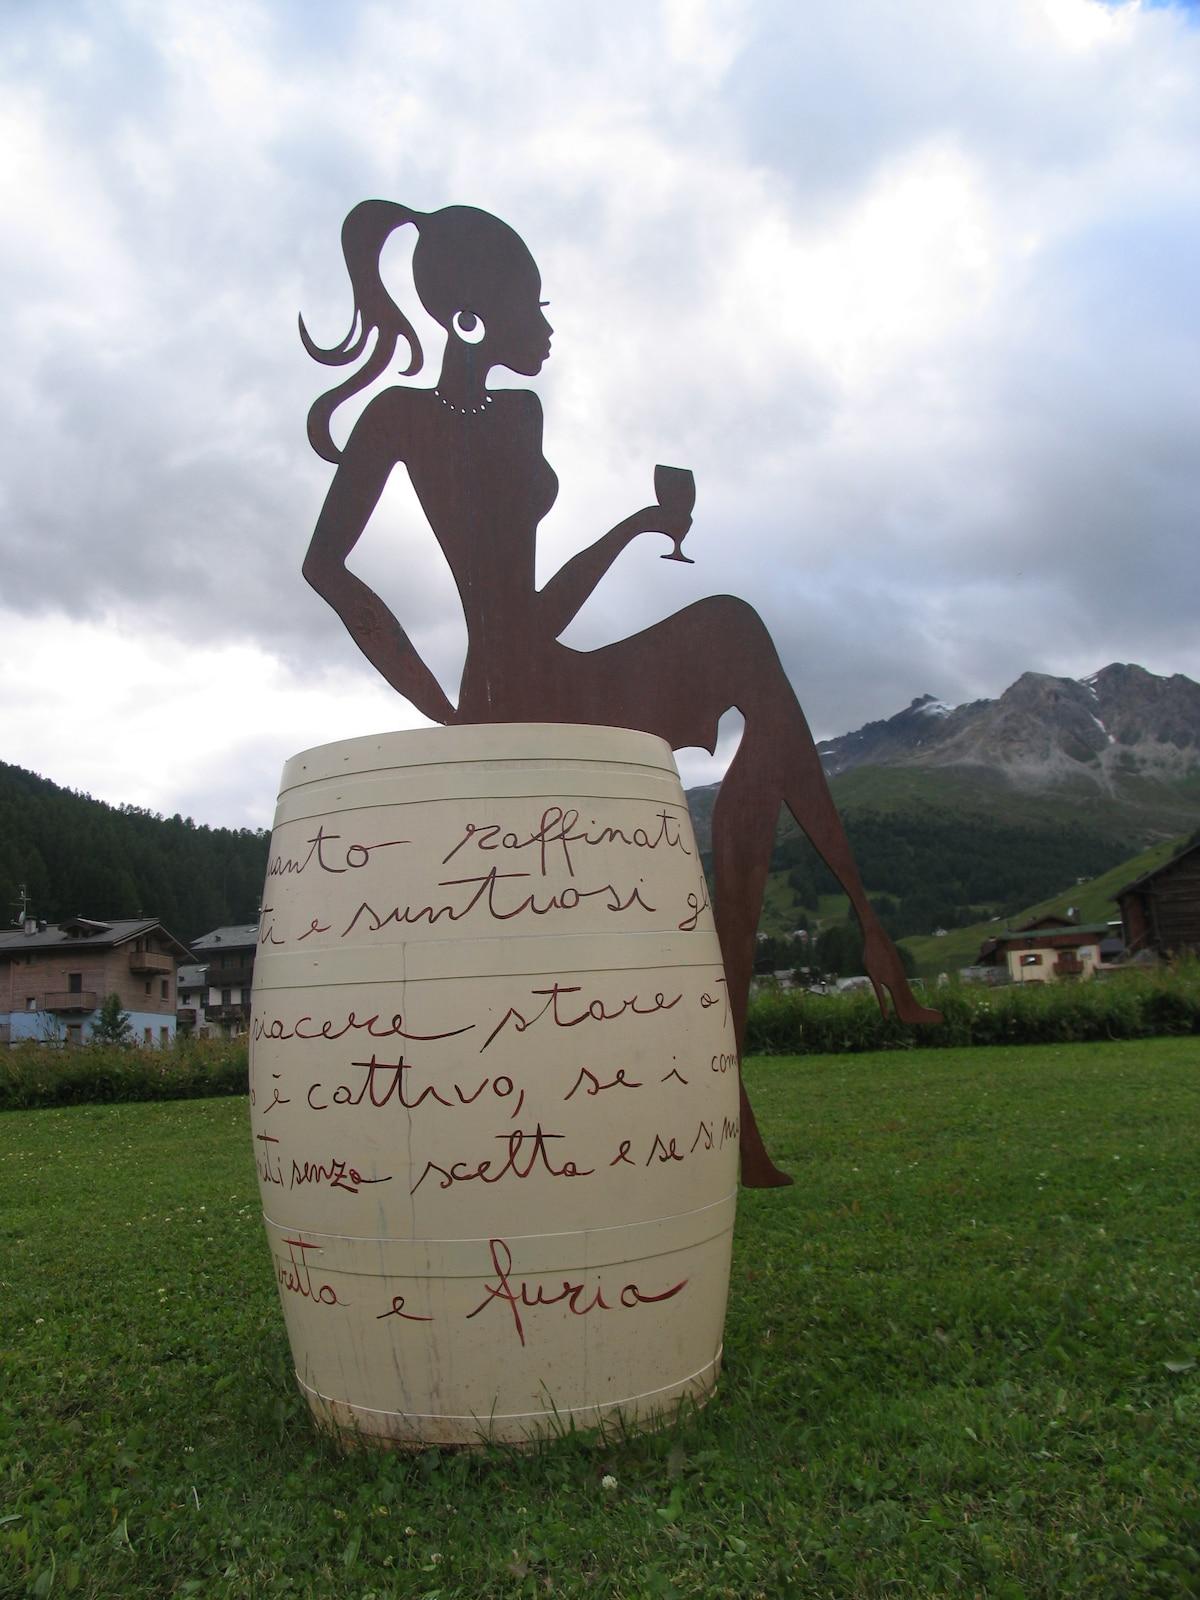 Vania From Saint Moritz, Switzerland